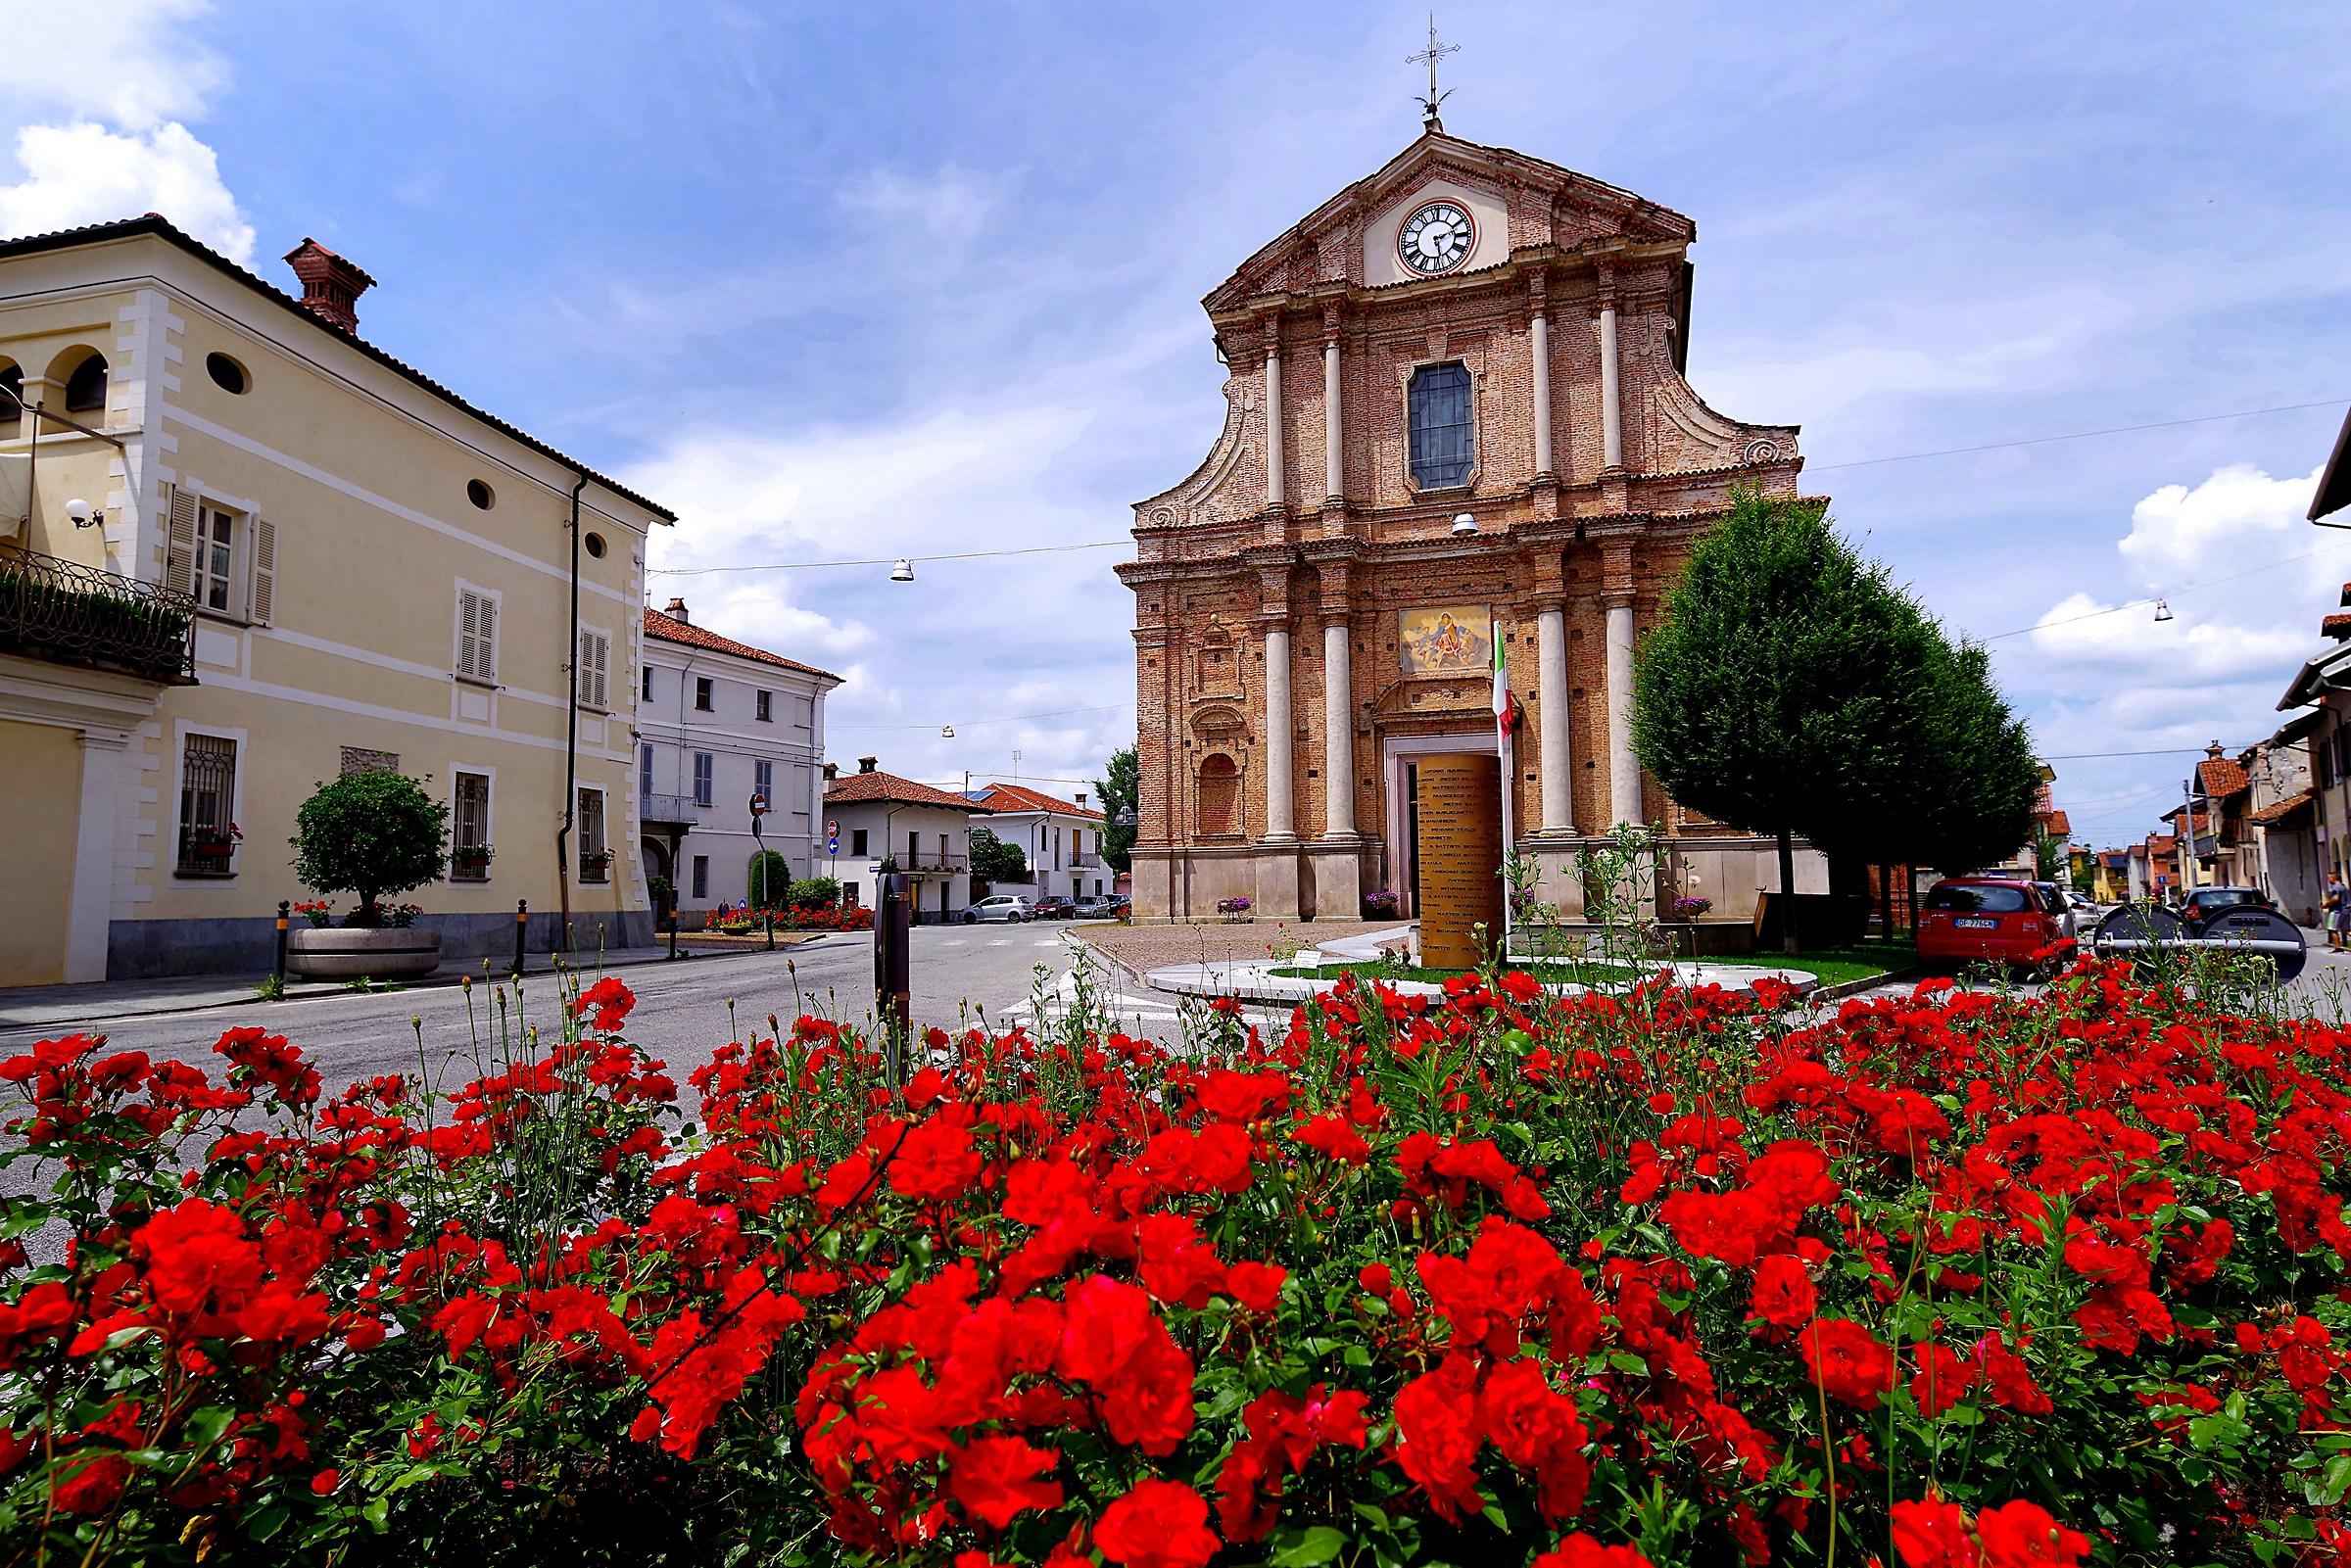 Sant'Albano Stura (Cn)...